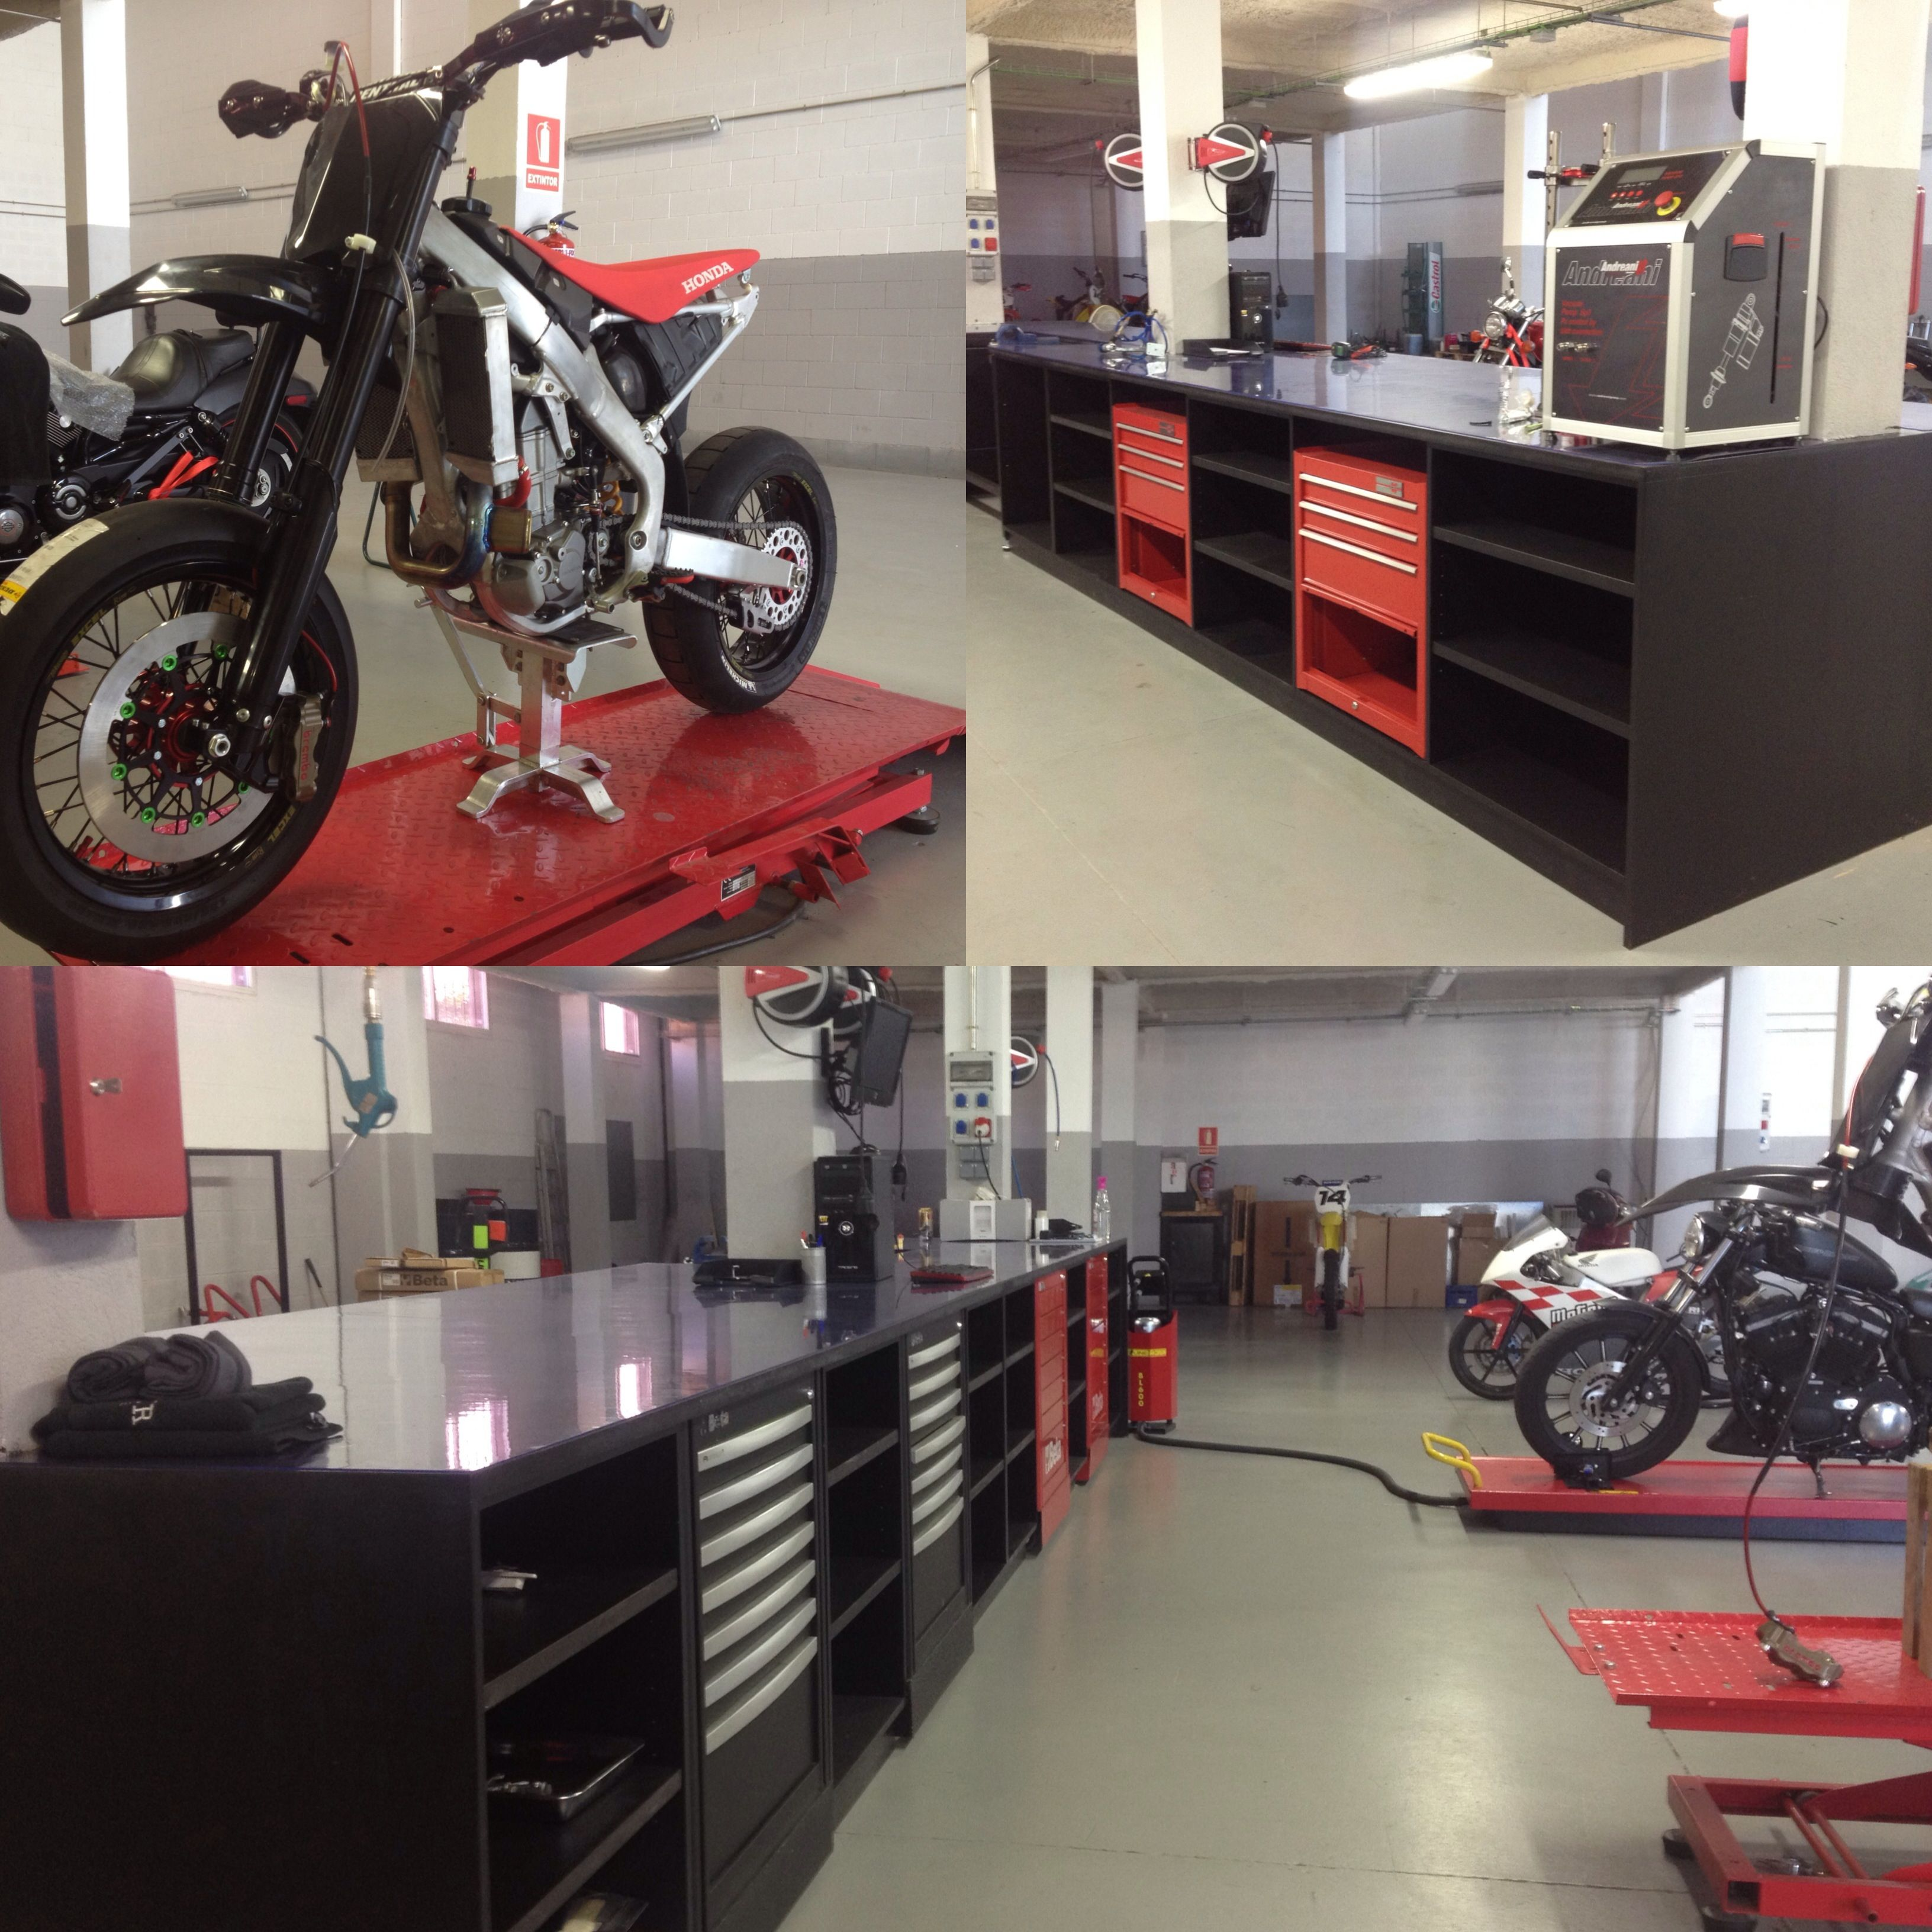 Garage Shop: @FGmotoworks , Workshop, Ufficina, Taller. Racing